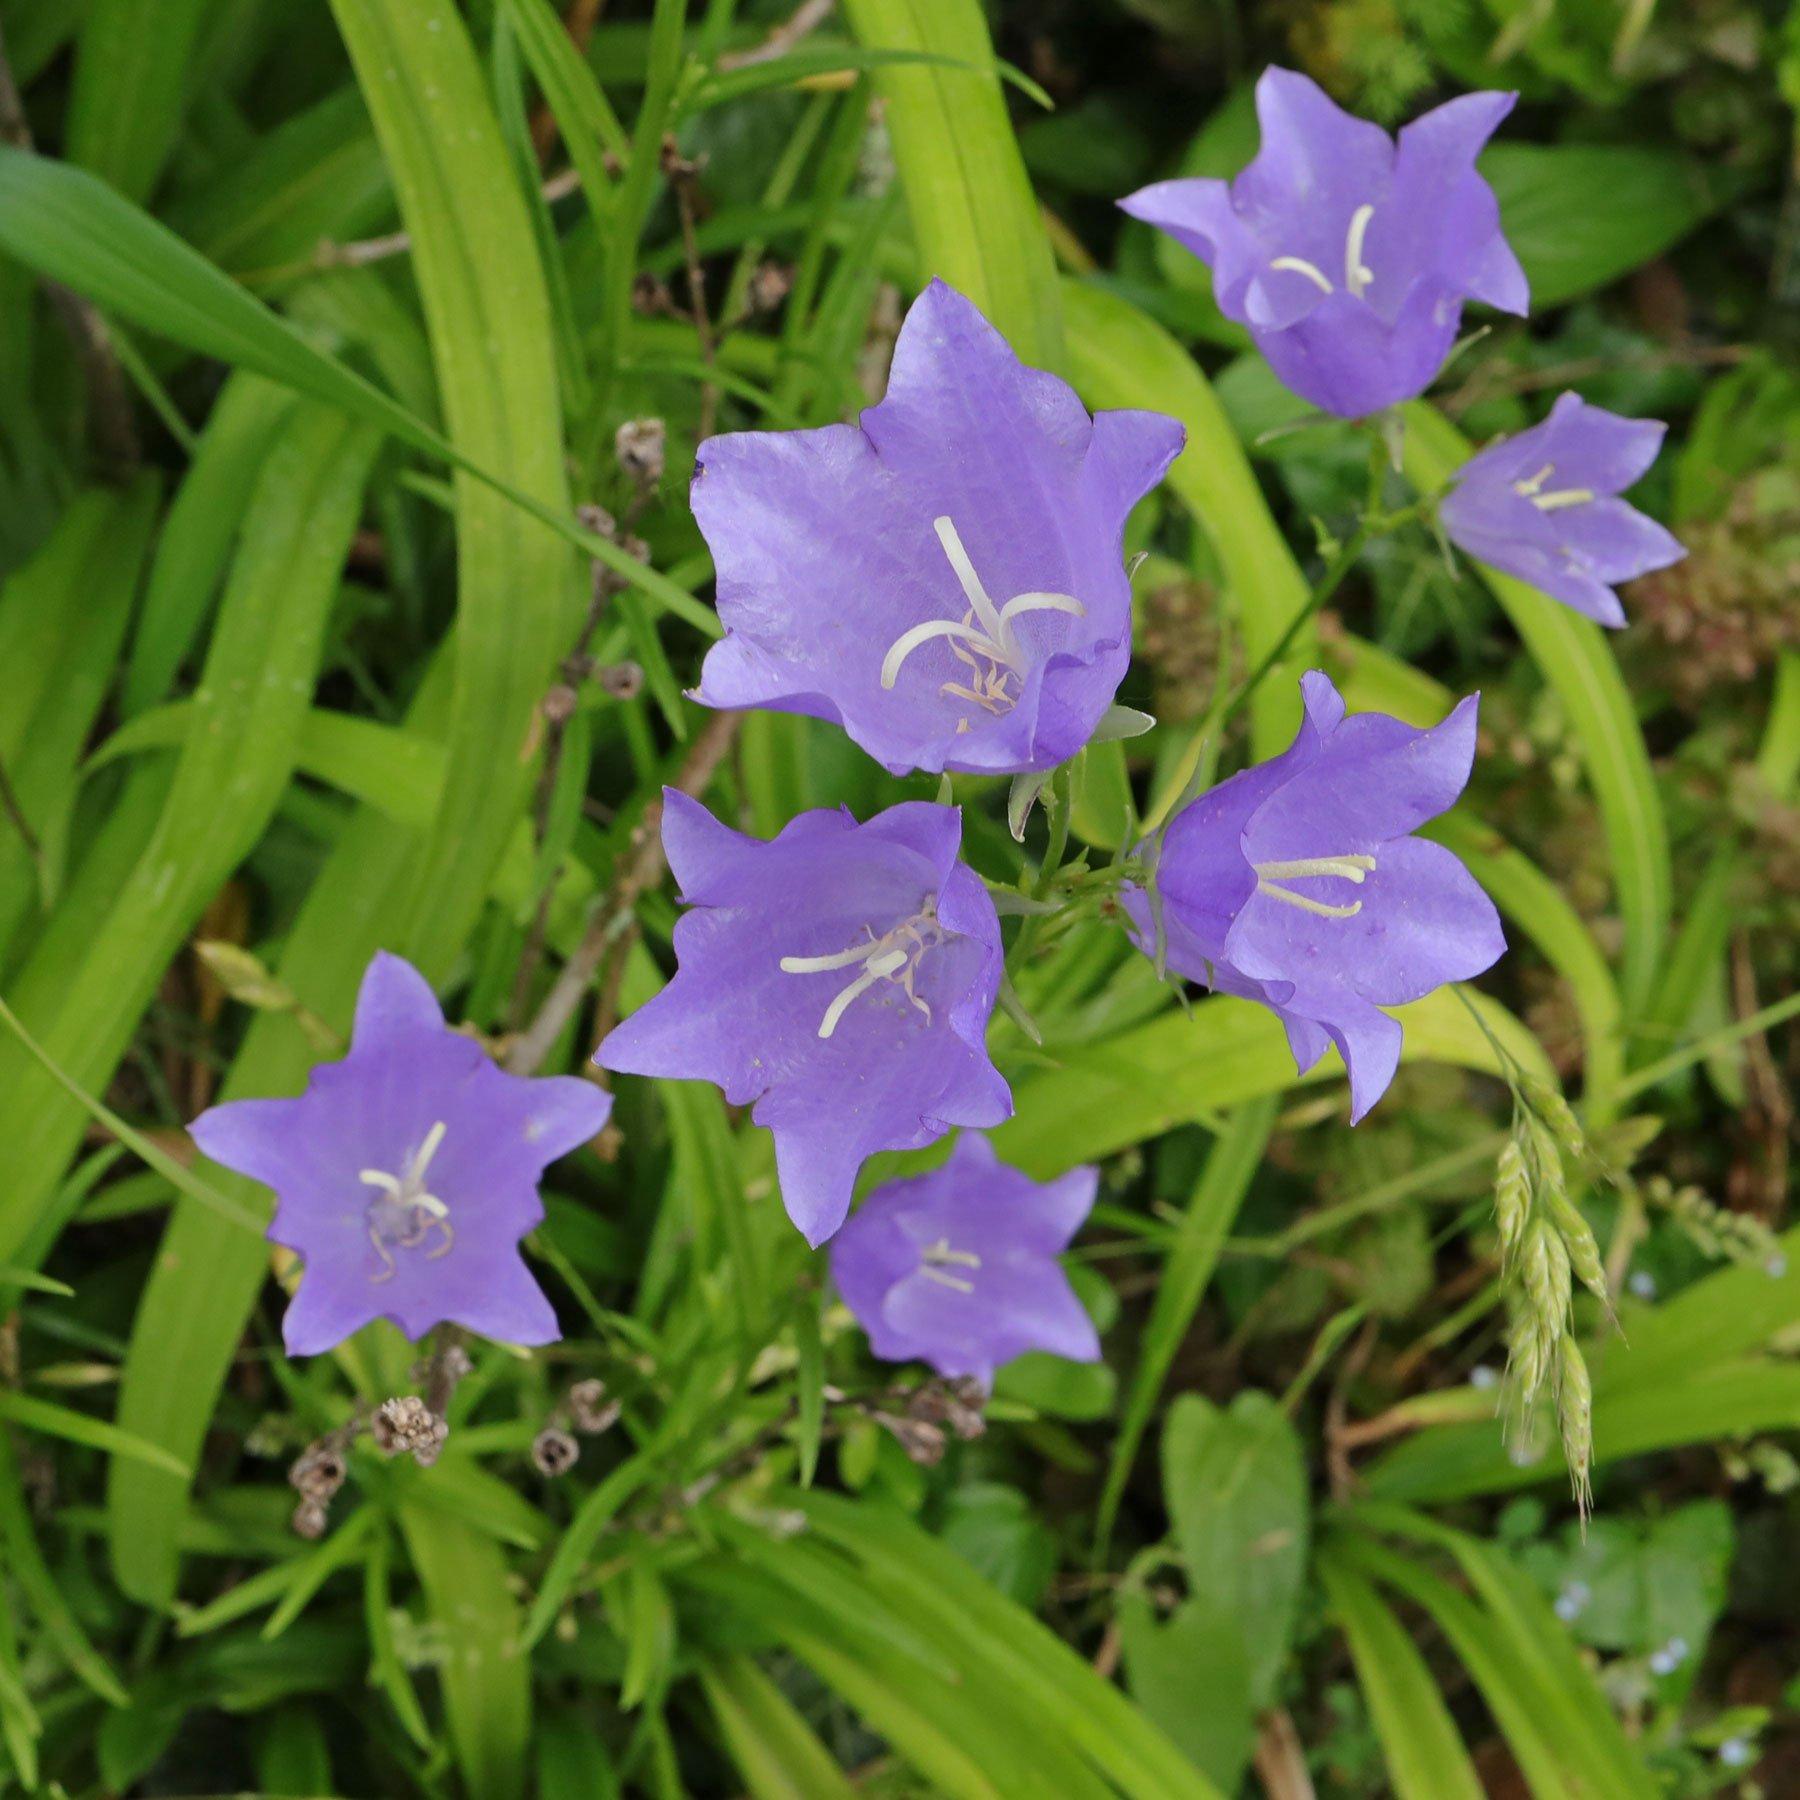 Glockenblume Blüten